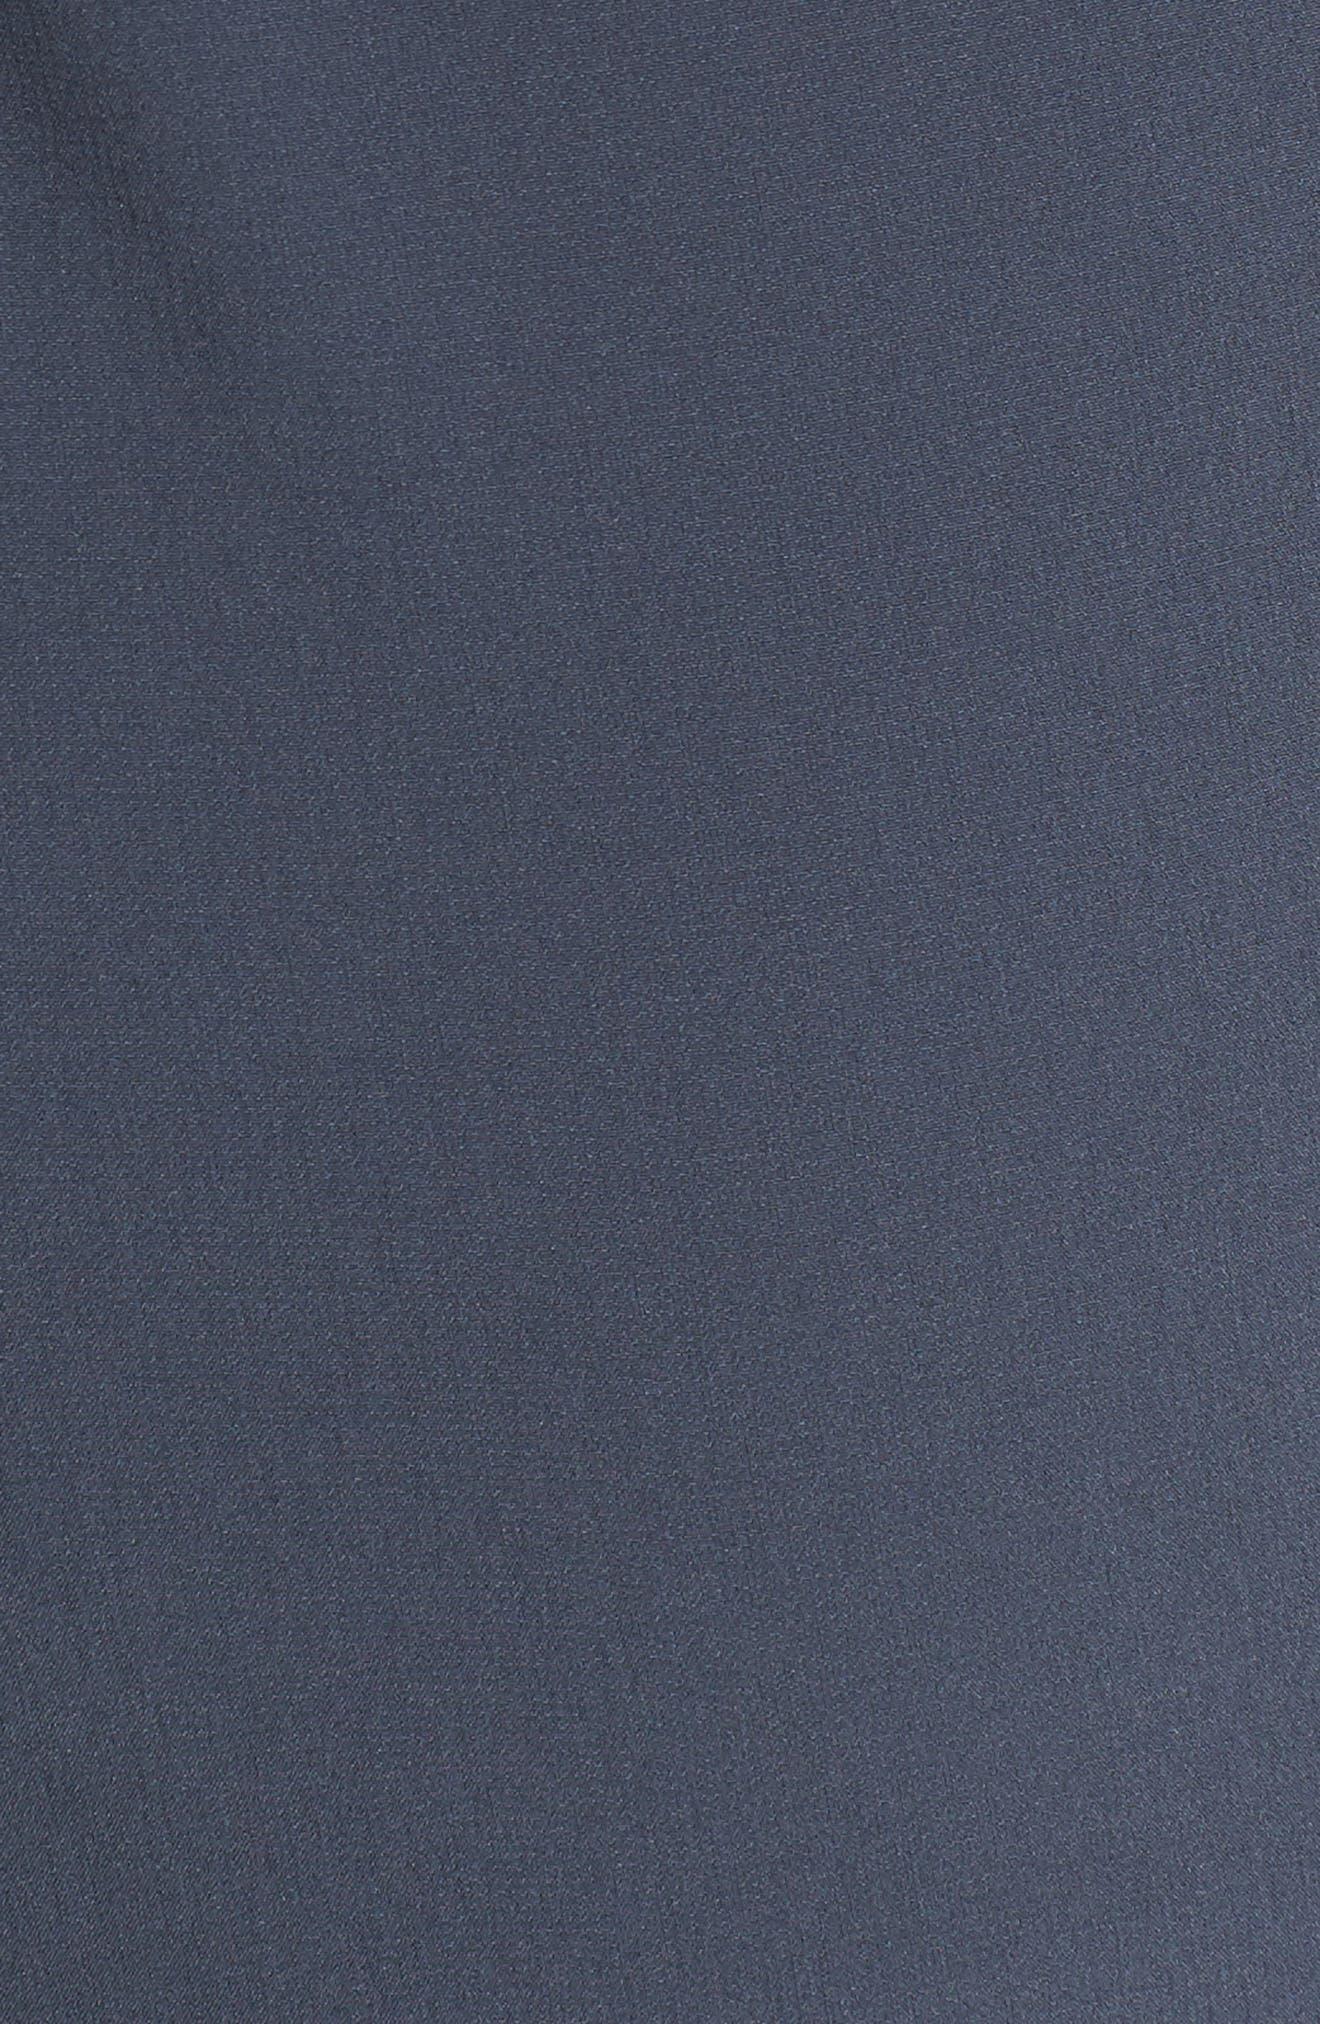 Perpetual Cargo Jogger Pants,                             Alternate thumbnail 5, color,                             Stealth Gray/ Black